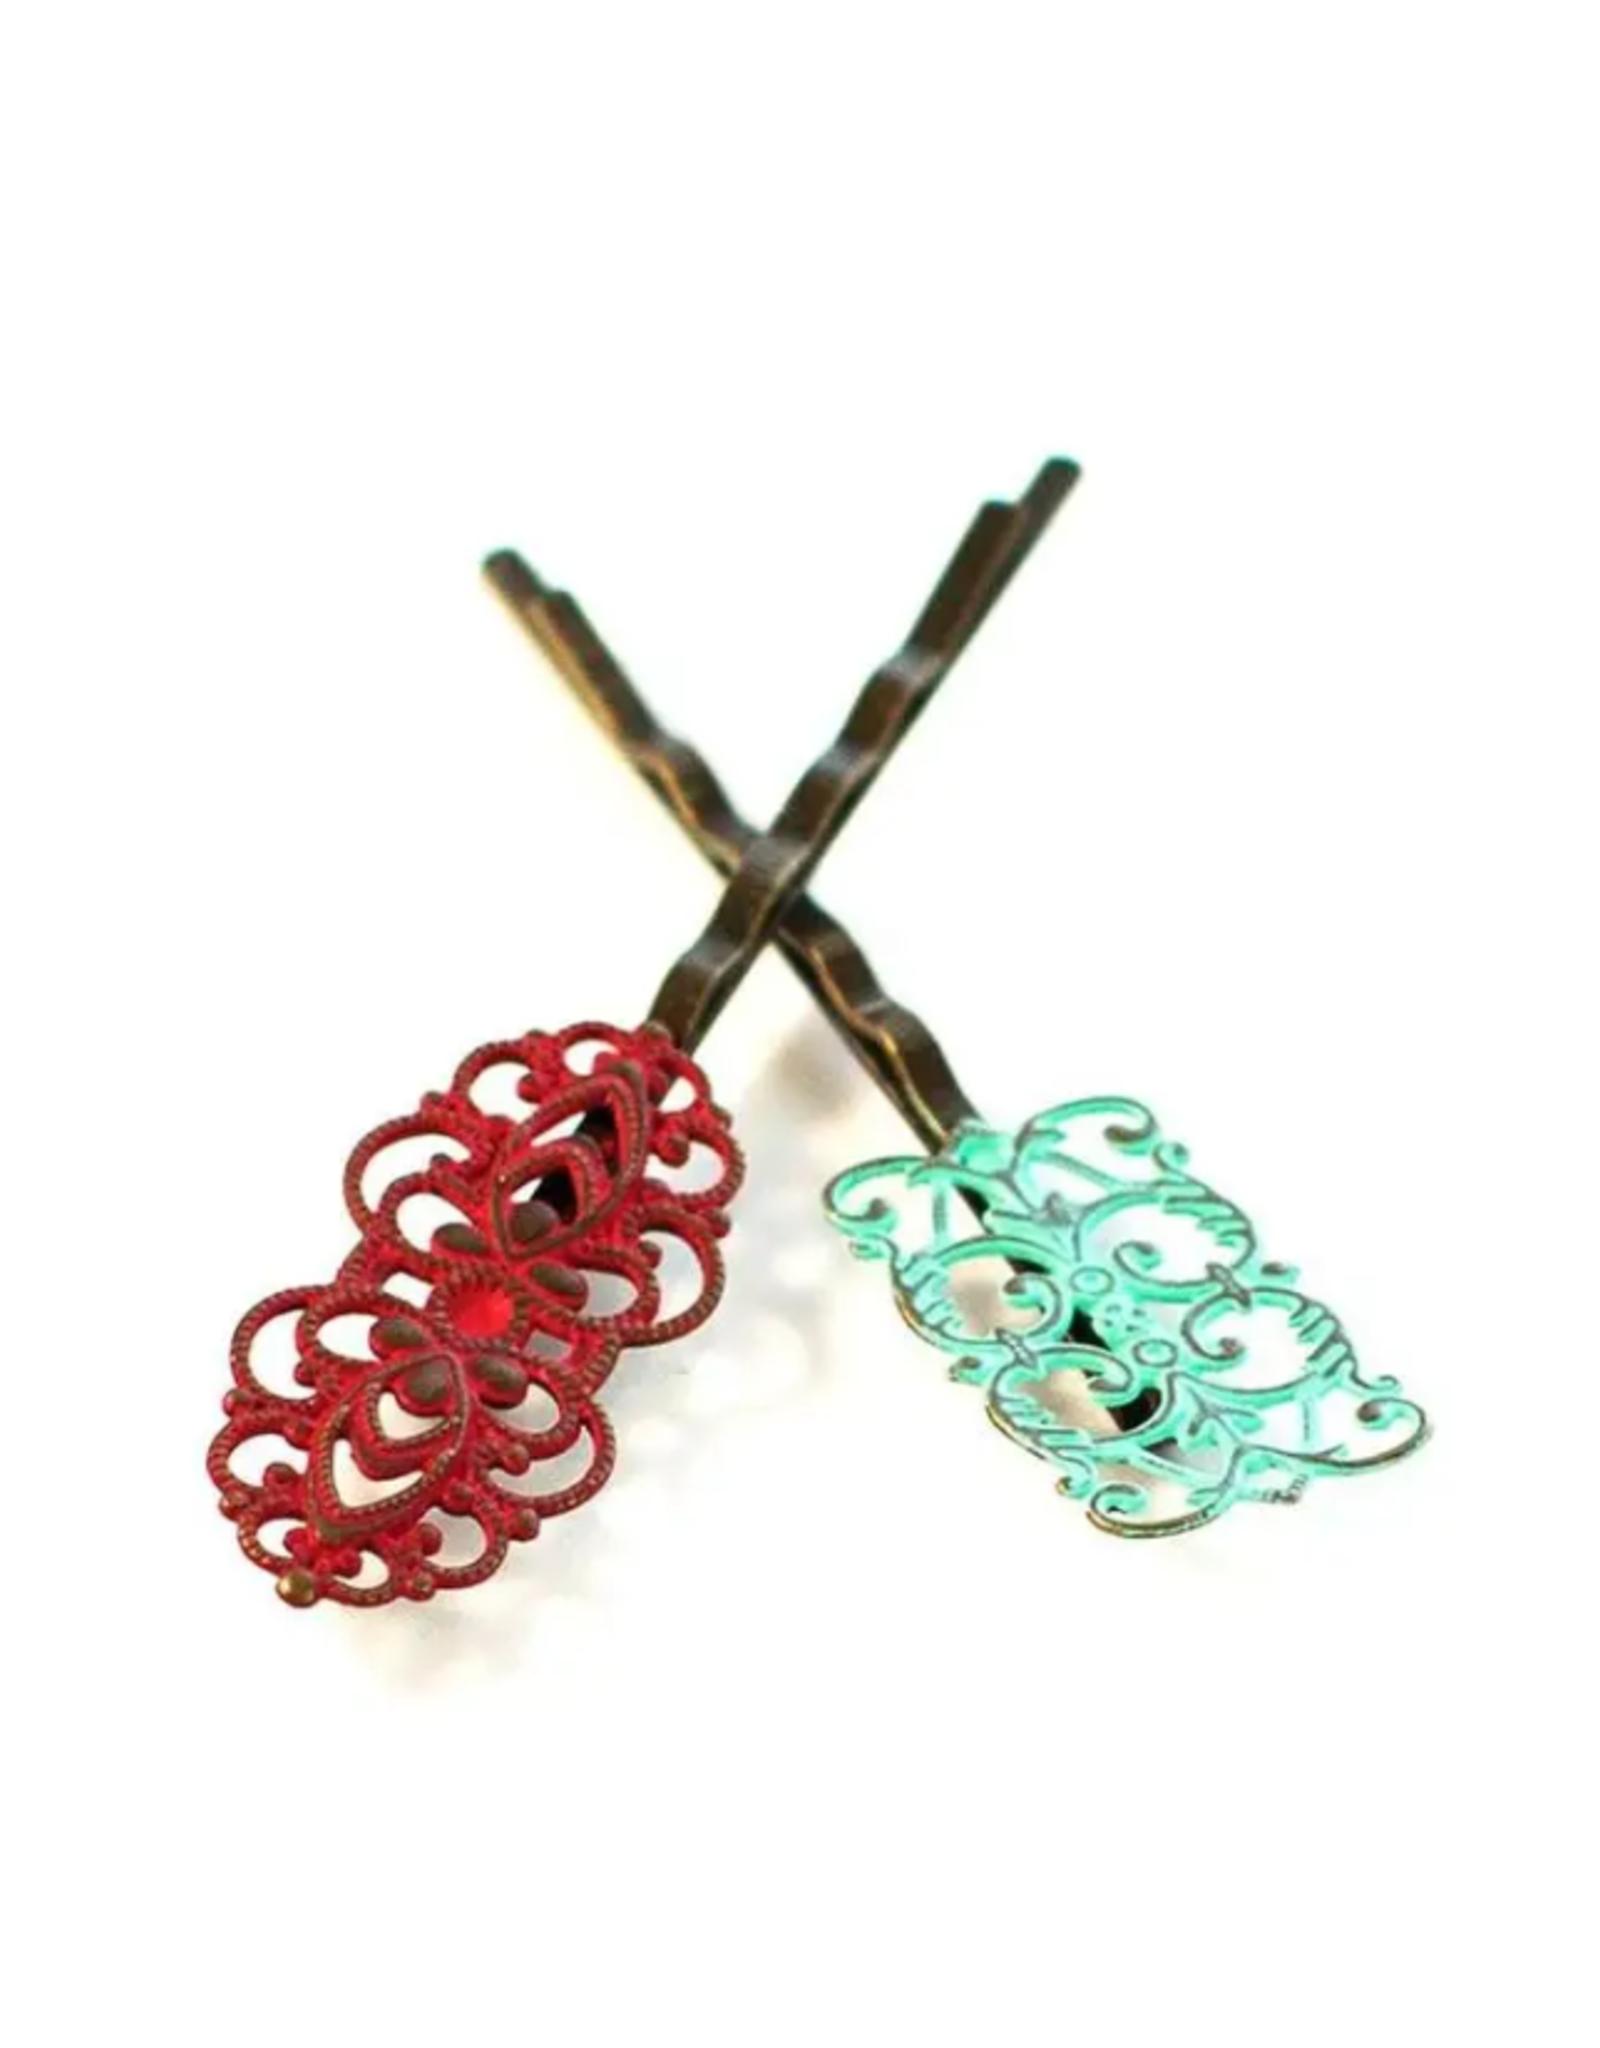 Gleeful Peacock Dainty bobby pins (Cherry & Mint)